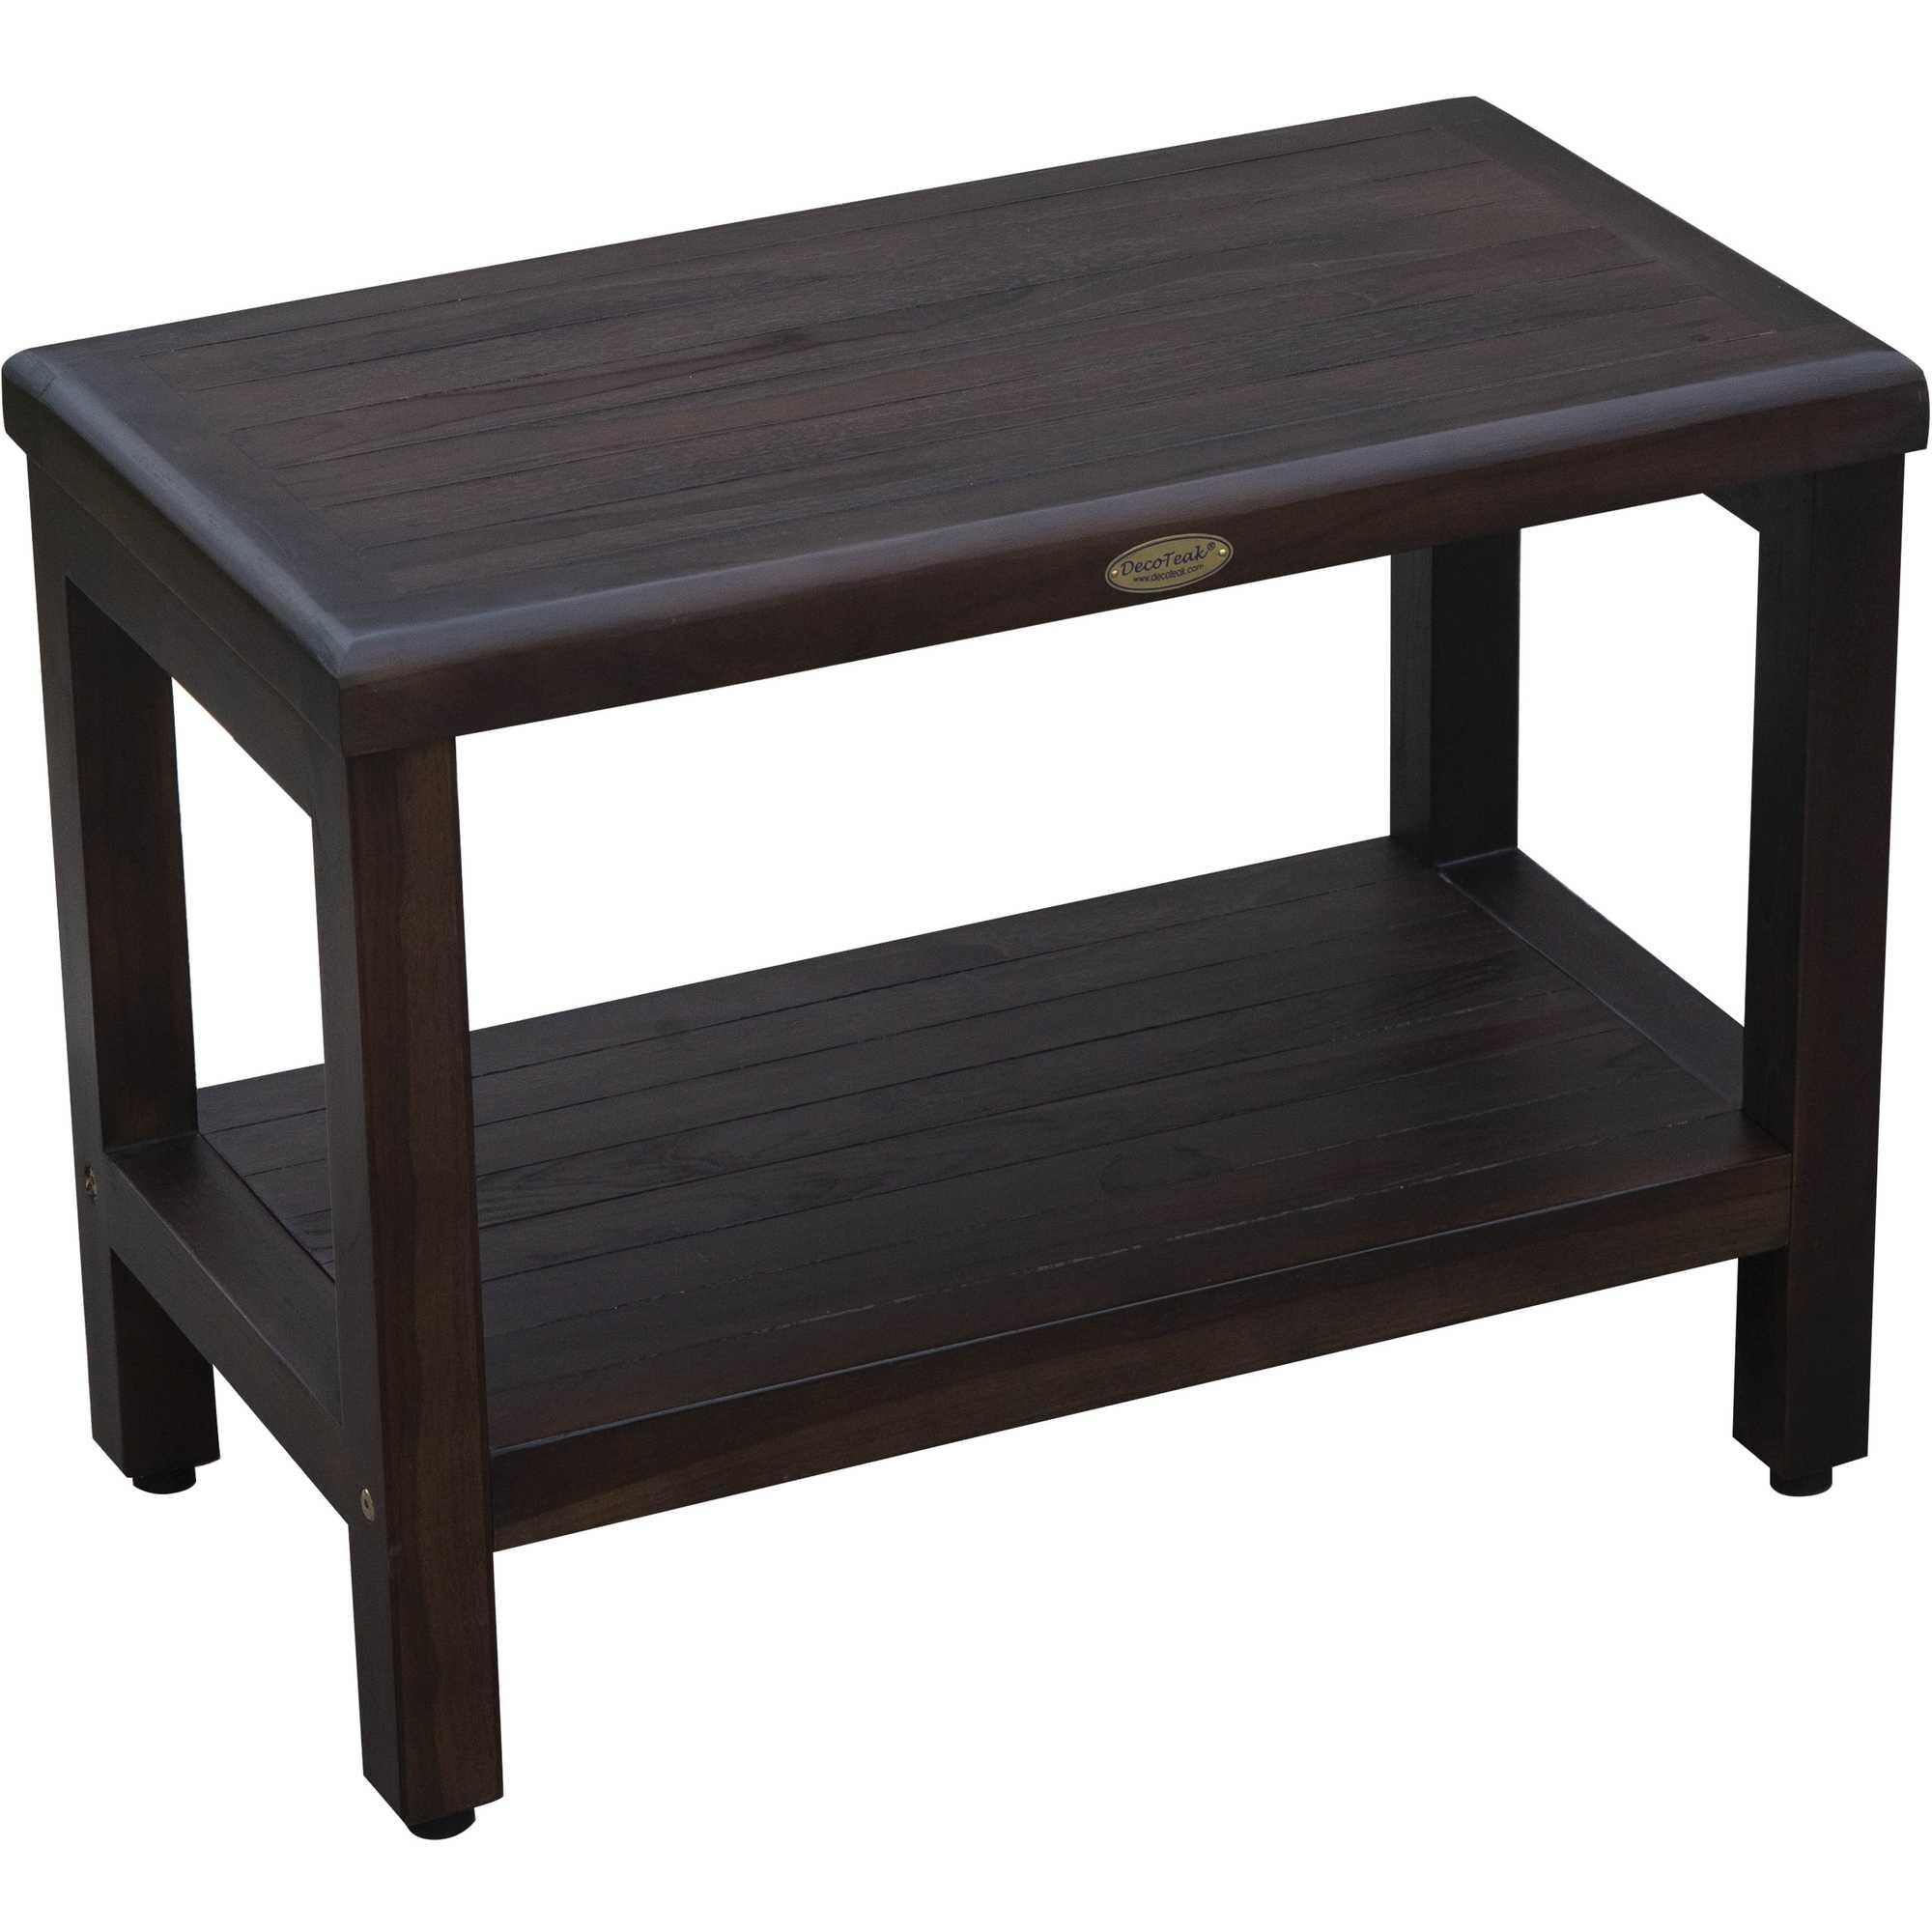 Rectangular Teak Shower Bench with Shelf in Brown Finish